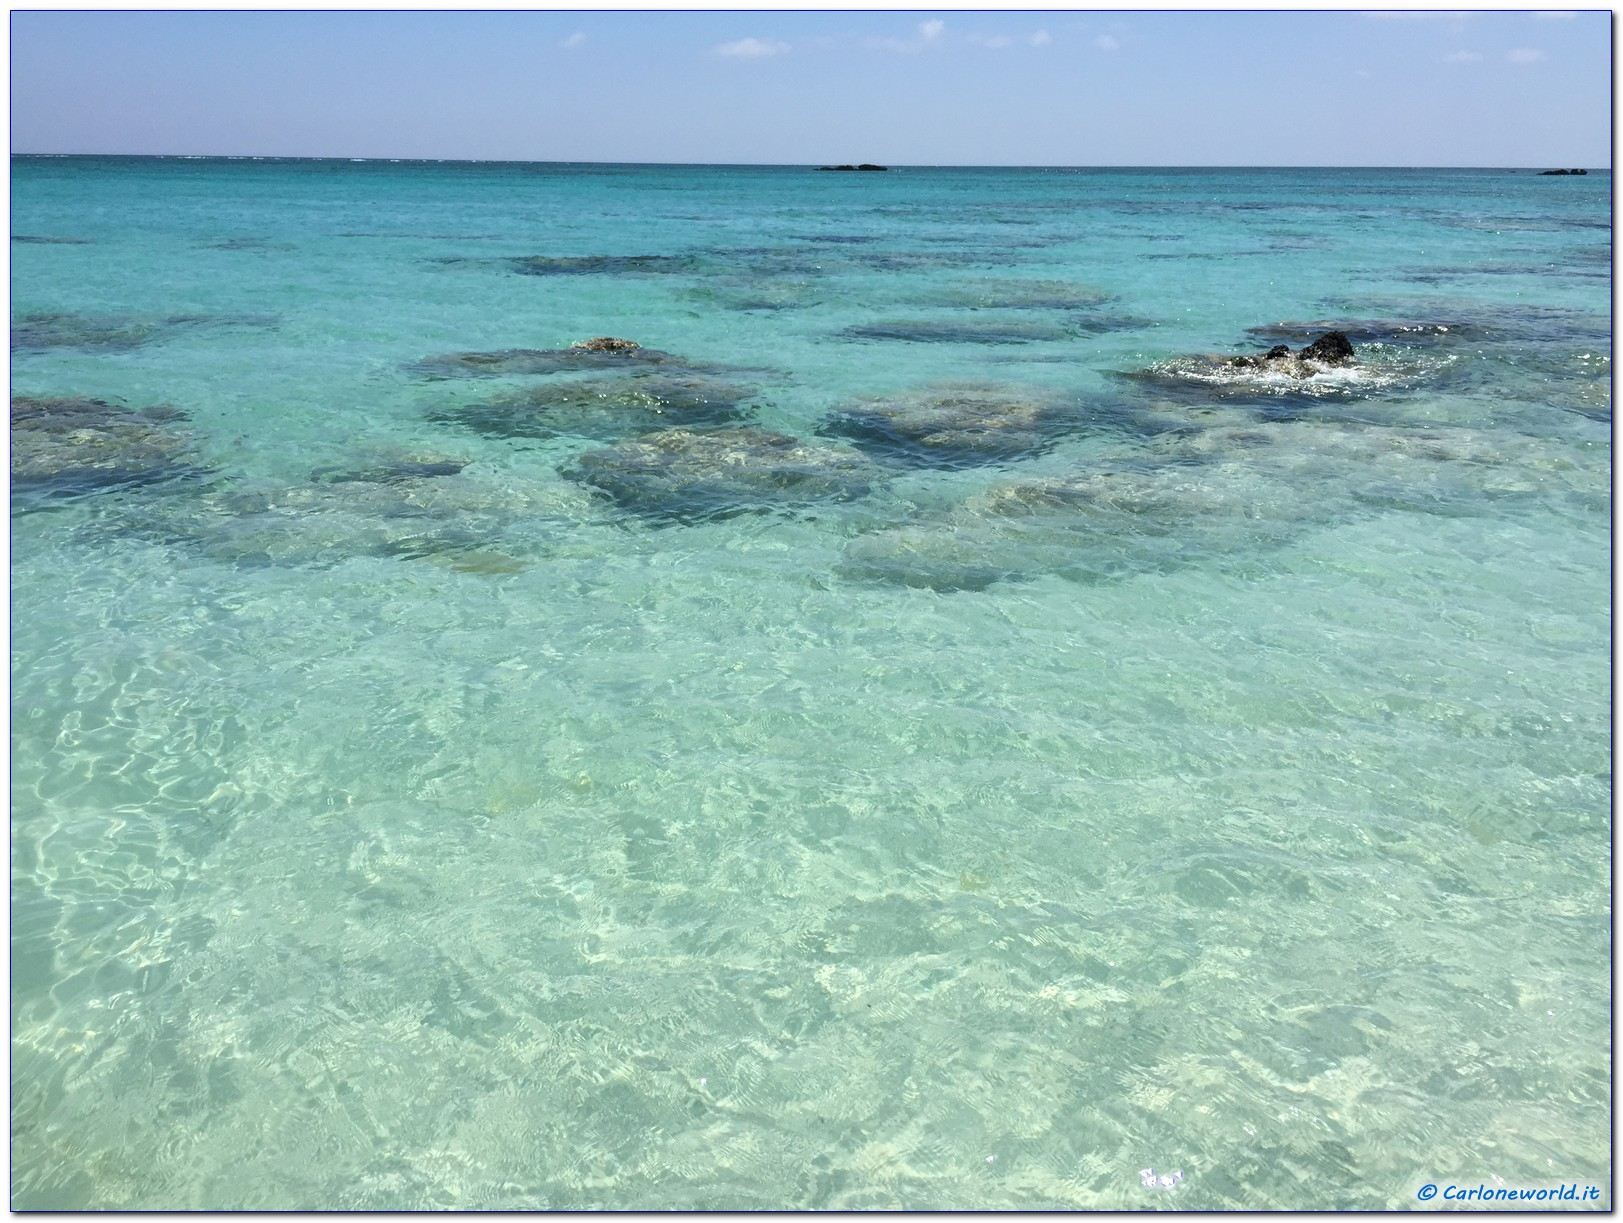 Mare spiaggia Elafonisi Creta,mare Elafonisi Creta,spaiggia Elafonisi